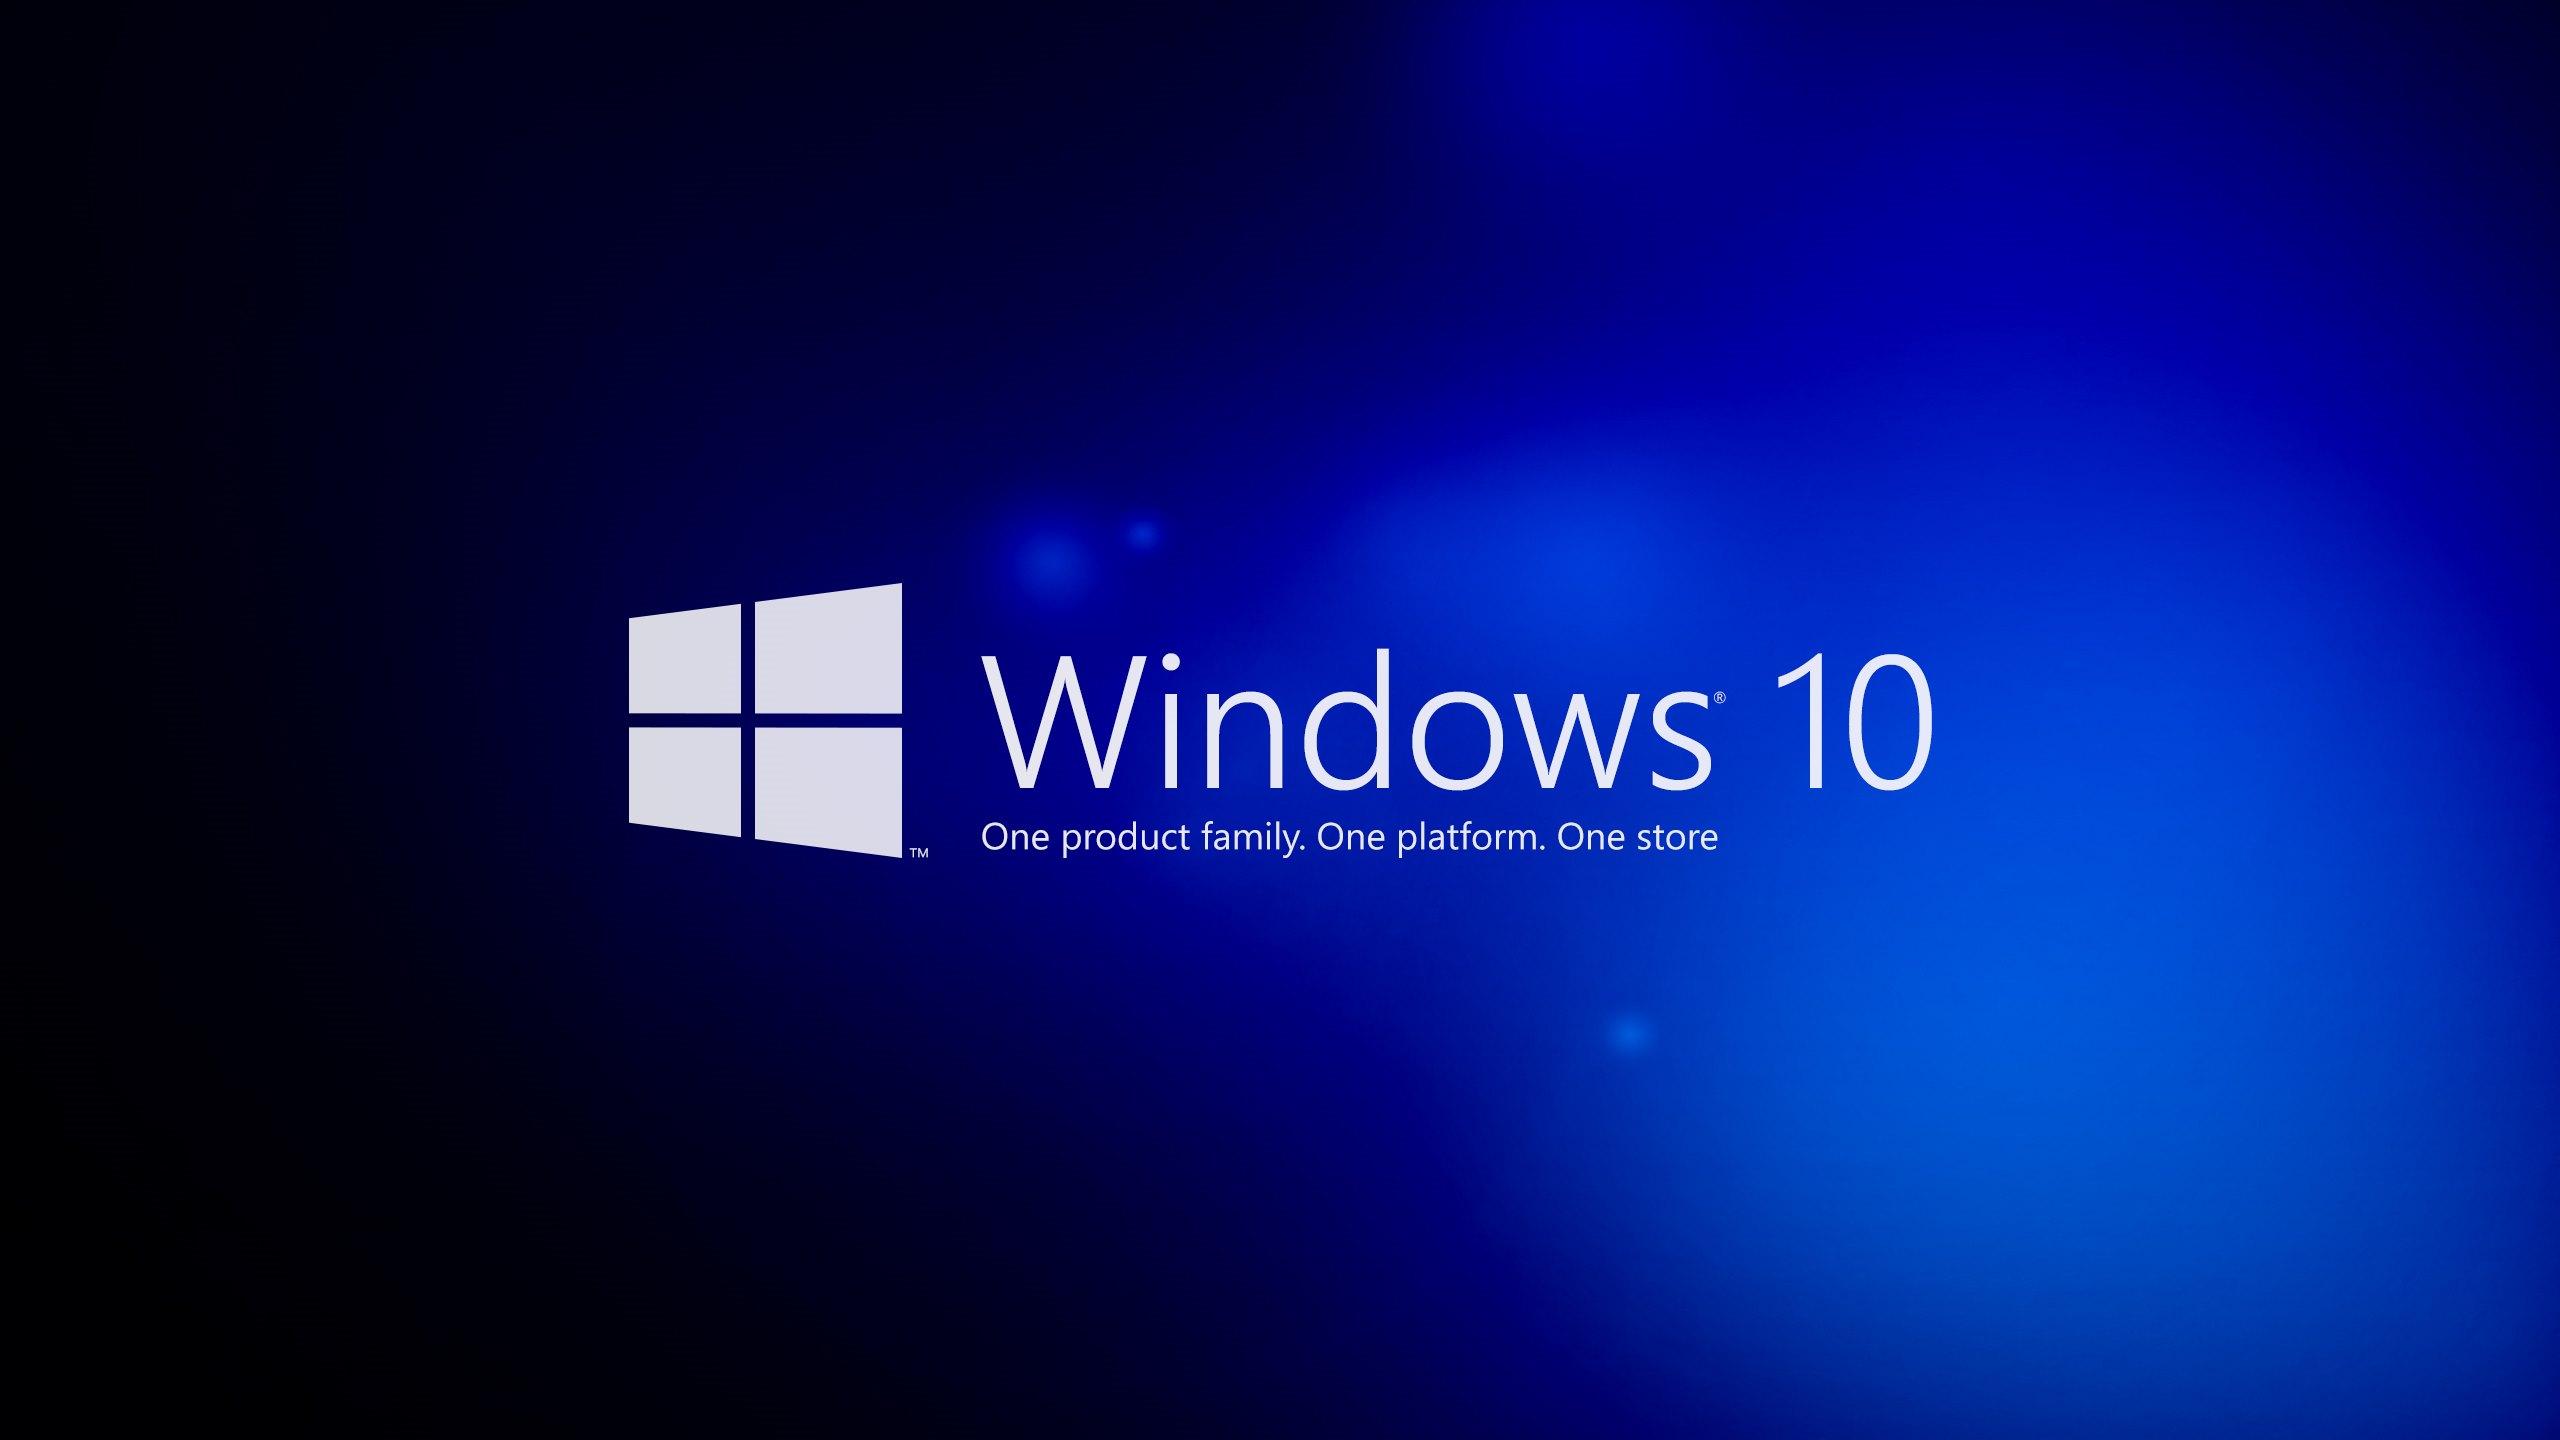 1280x800 logo windows - photo #18